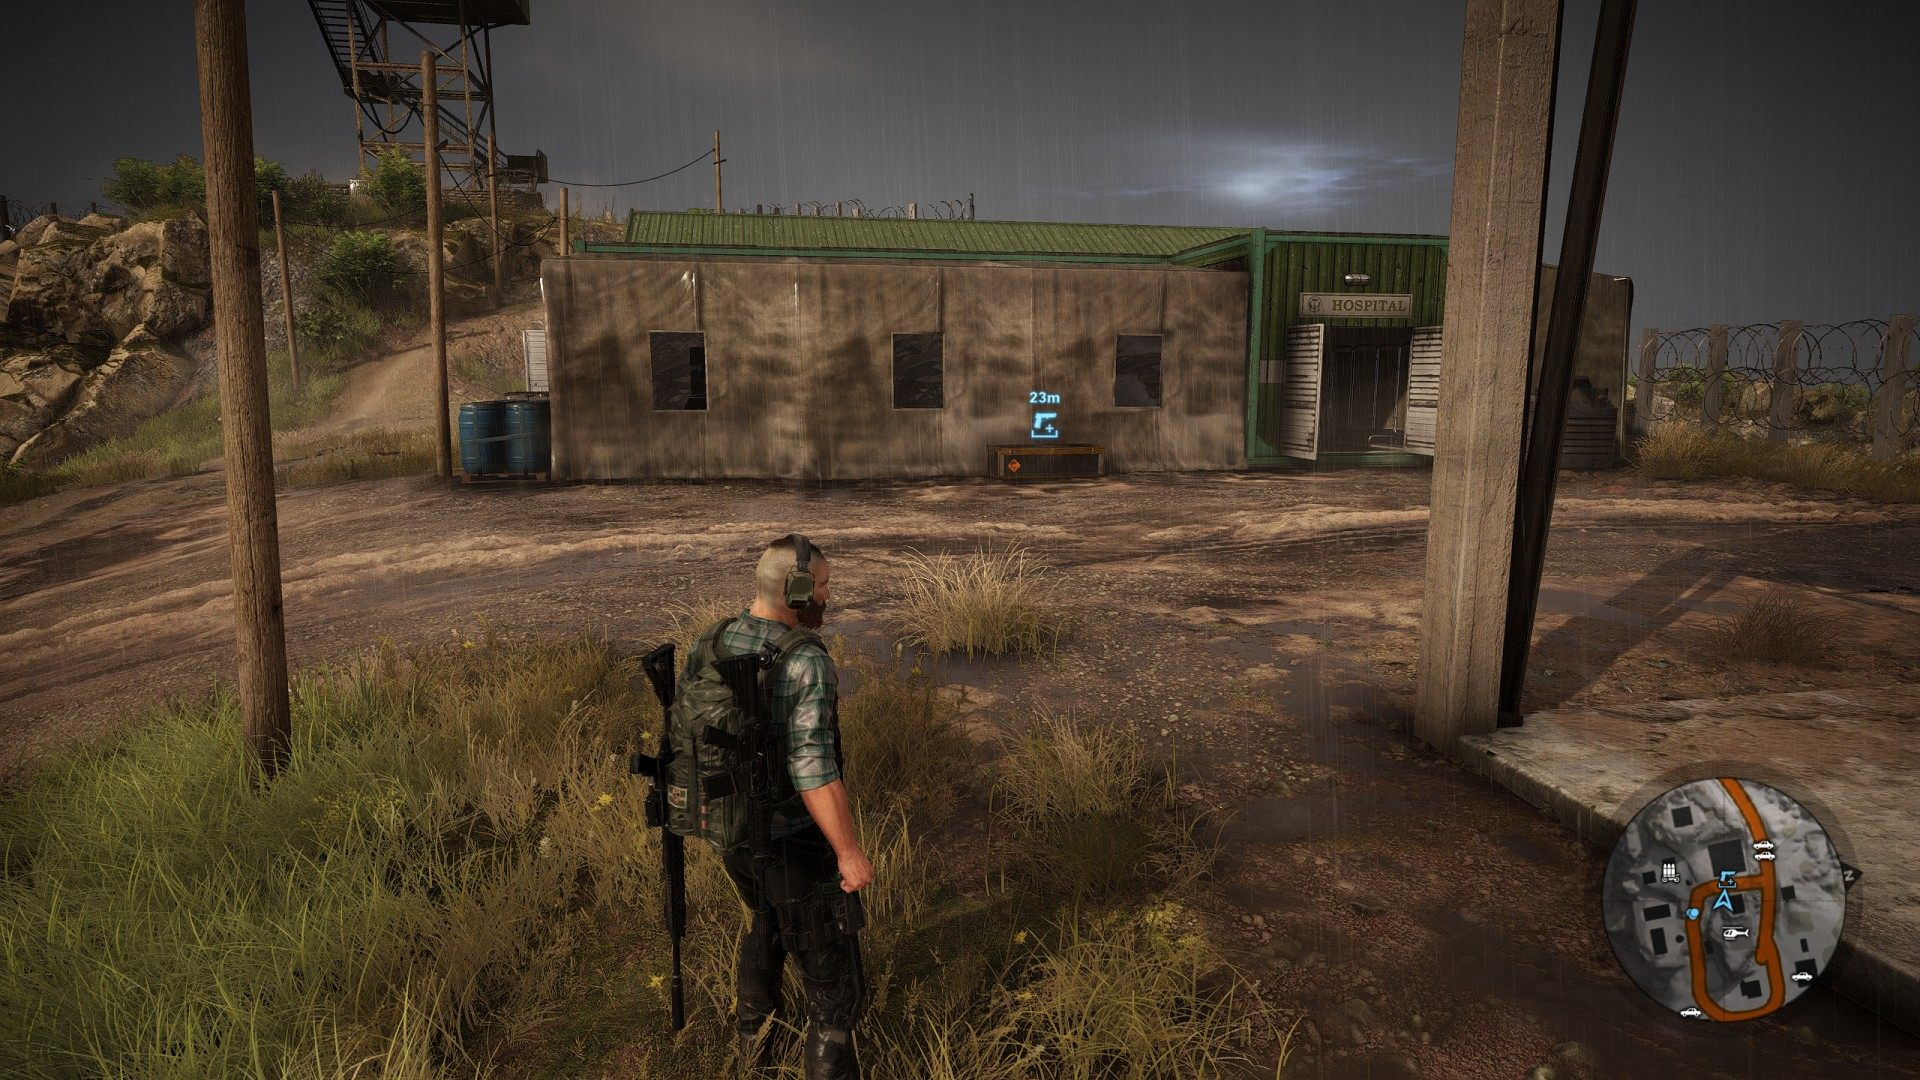 Weapon Cases, Fallen Ghosts, Ghost Recon: Wildlands Points of interest